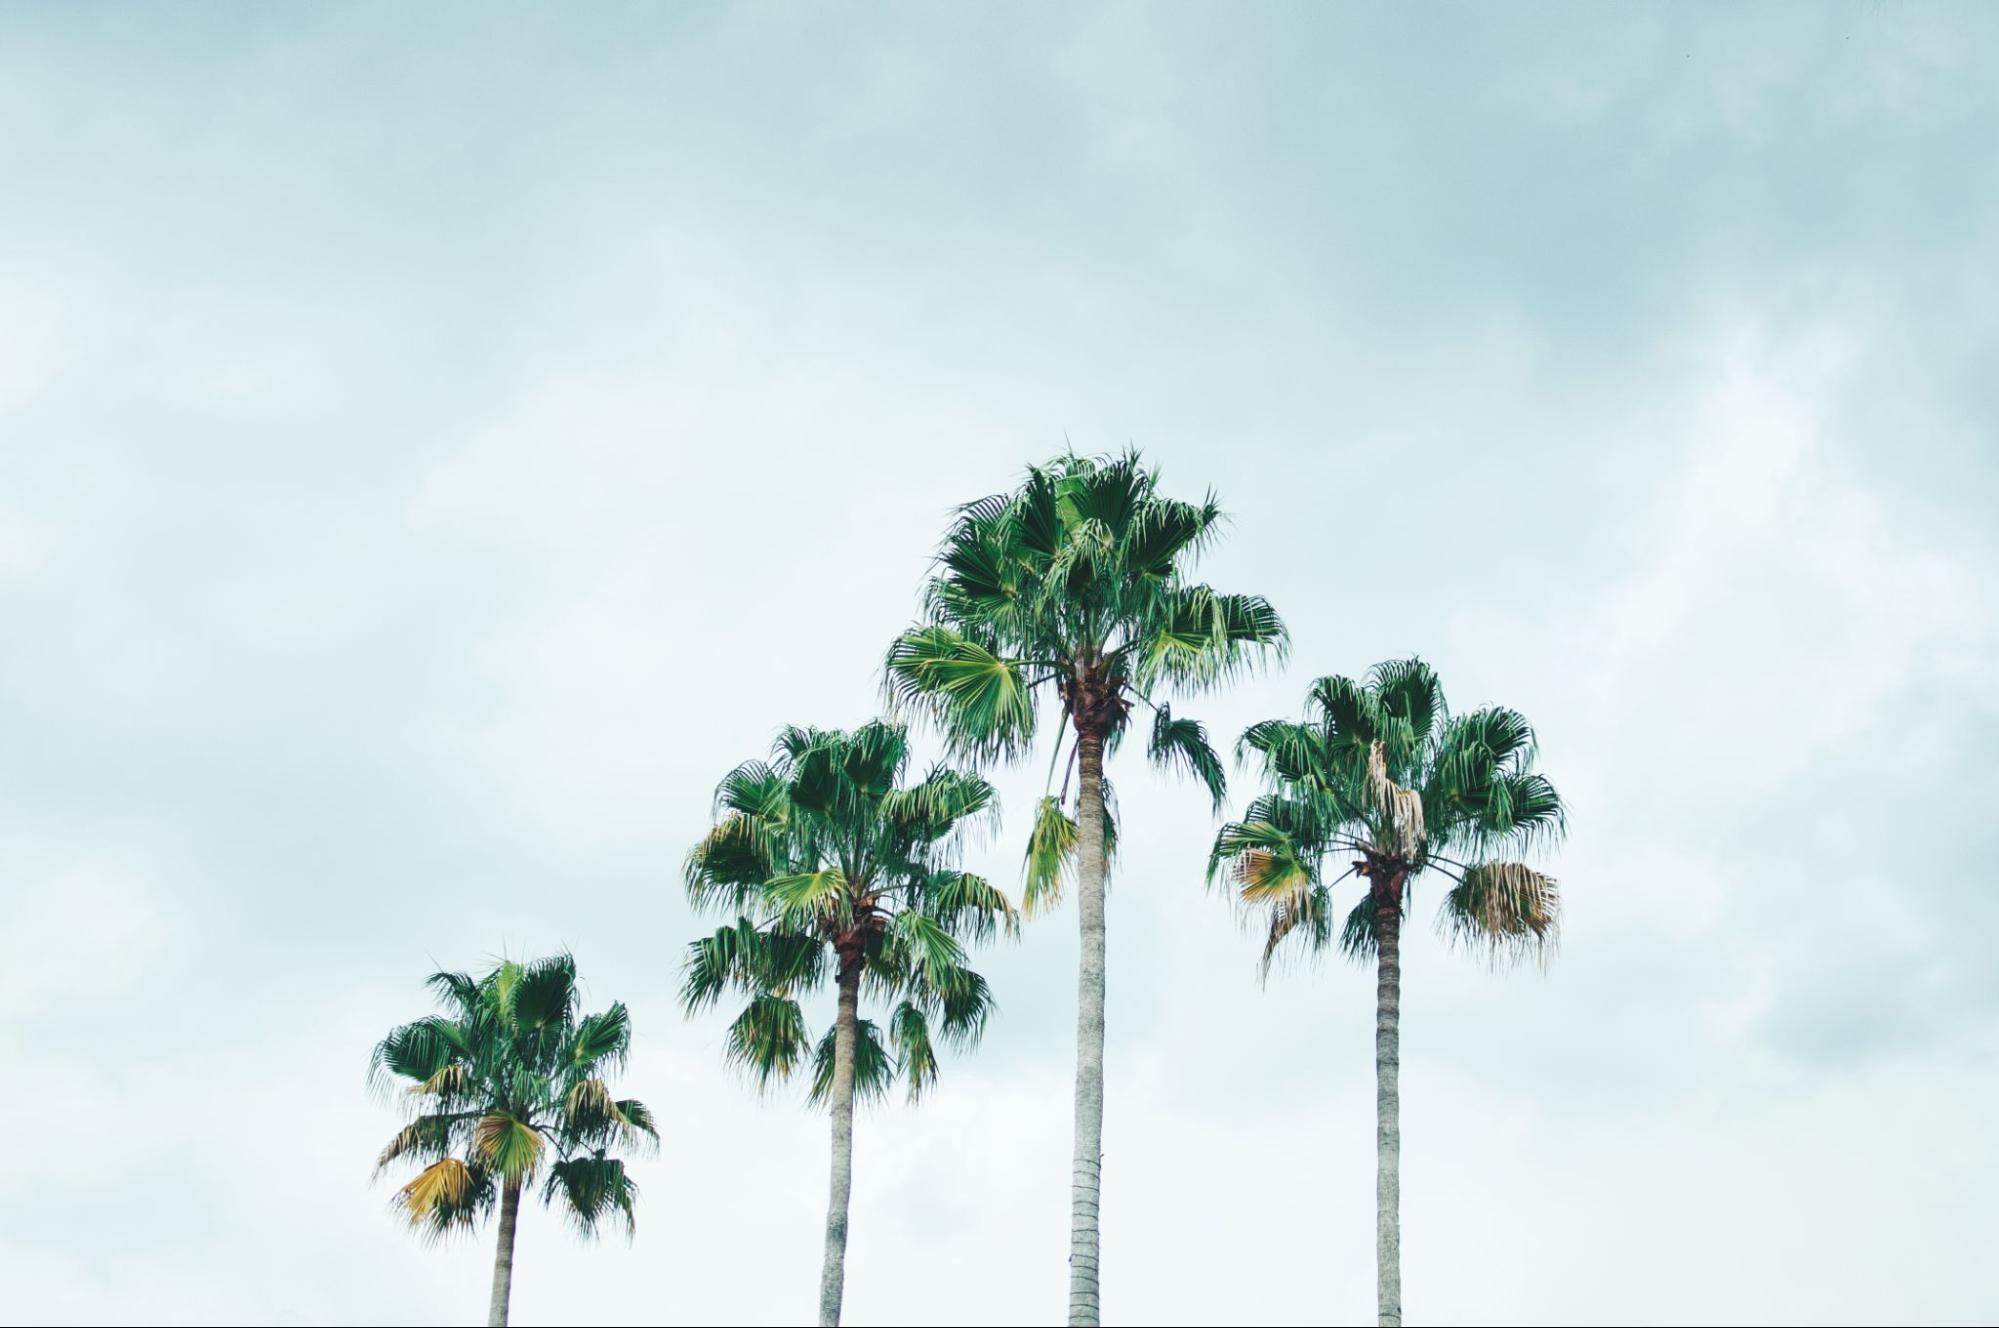 Palm trees in Orlando, Florida